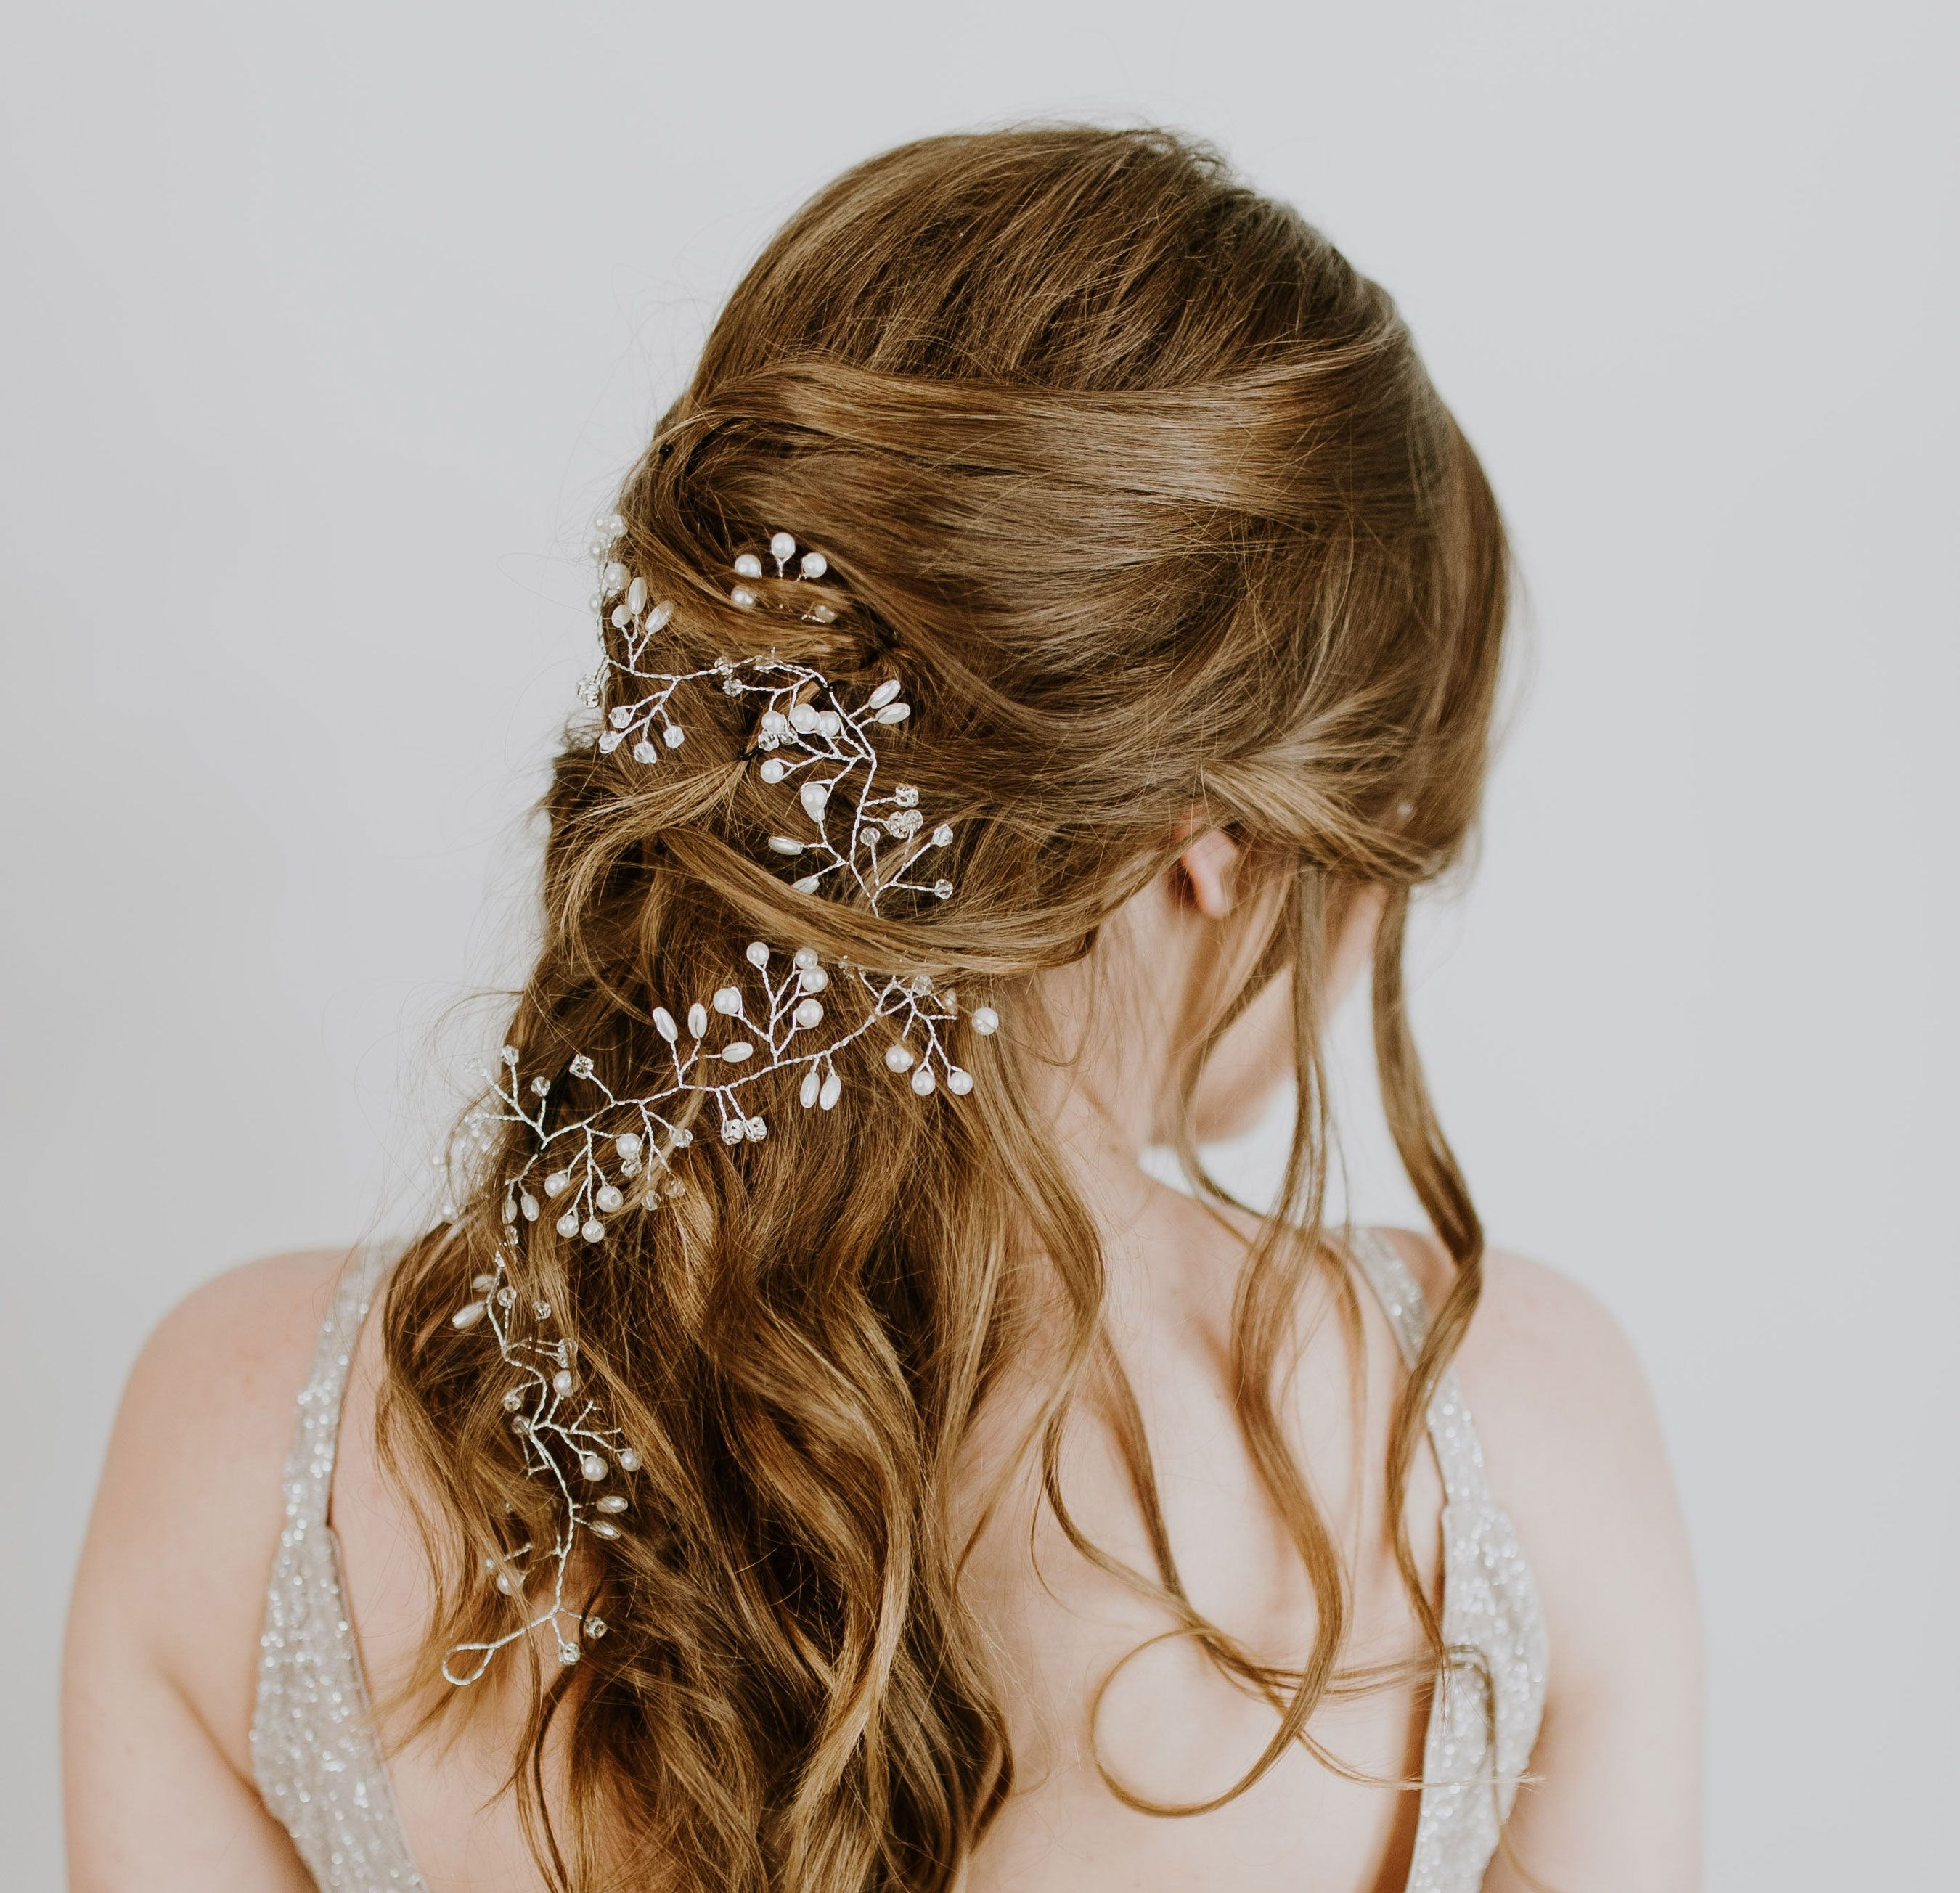 Bridal Hair & Upstyling Salon in Syracuse, NY